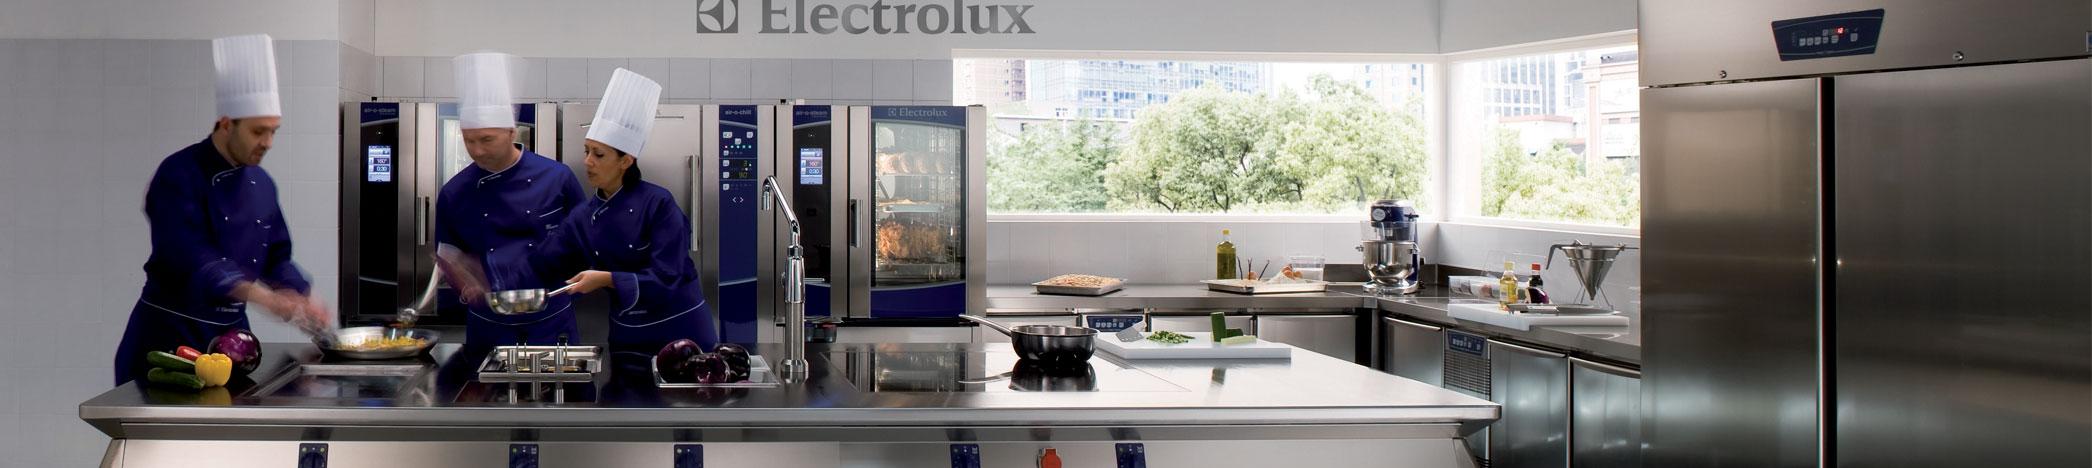 electrolux-brand-image.jpg